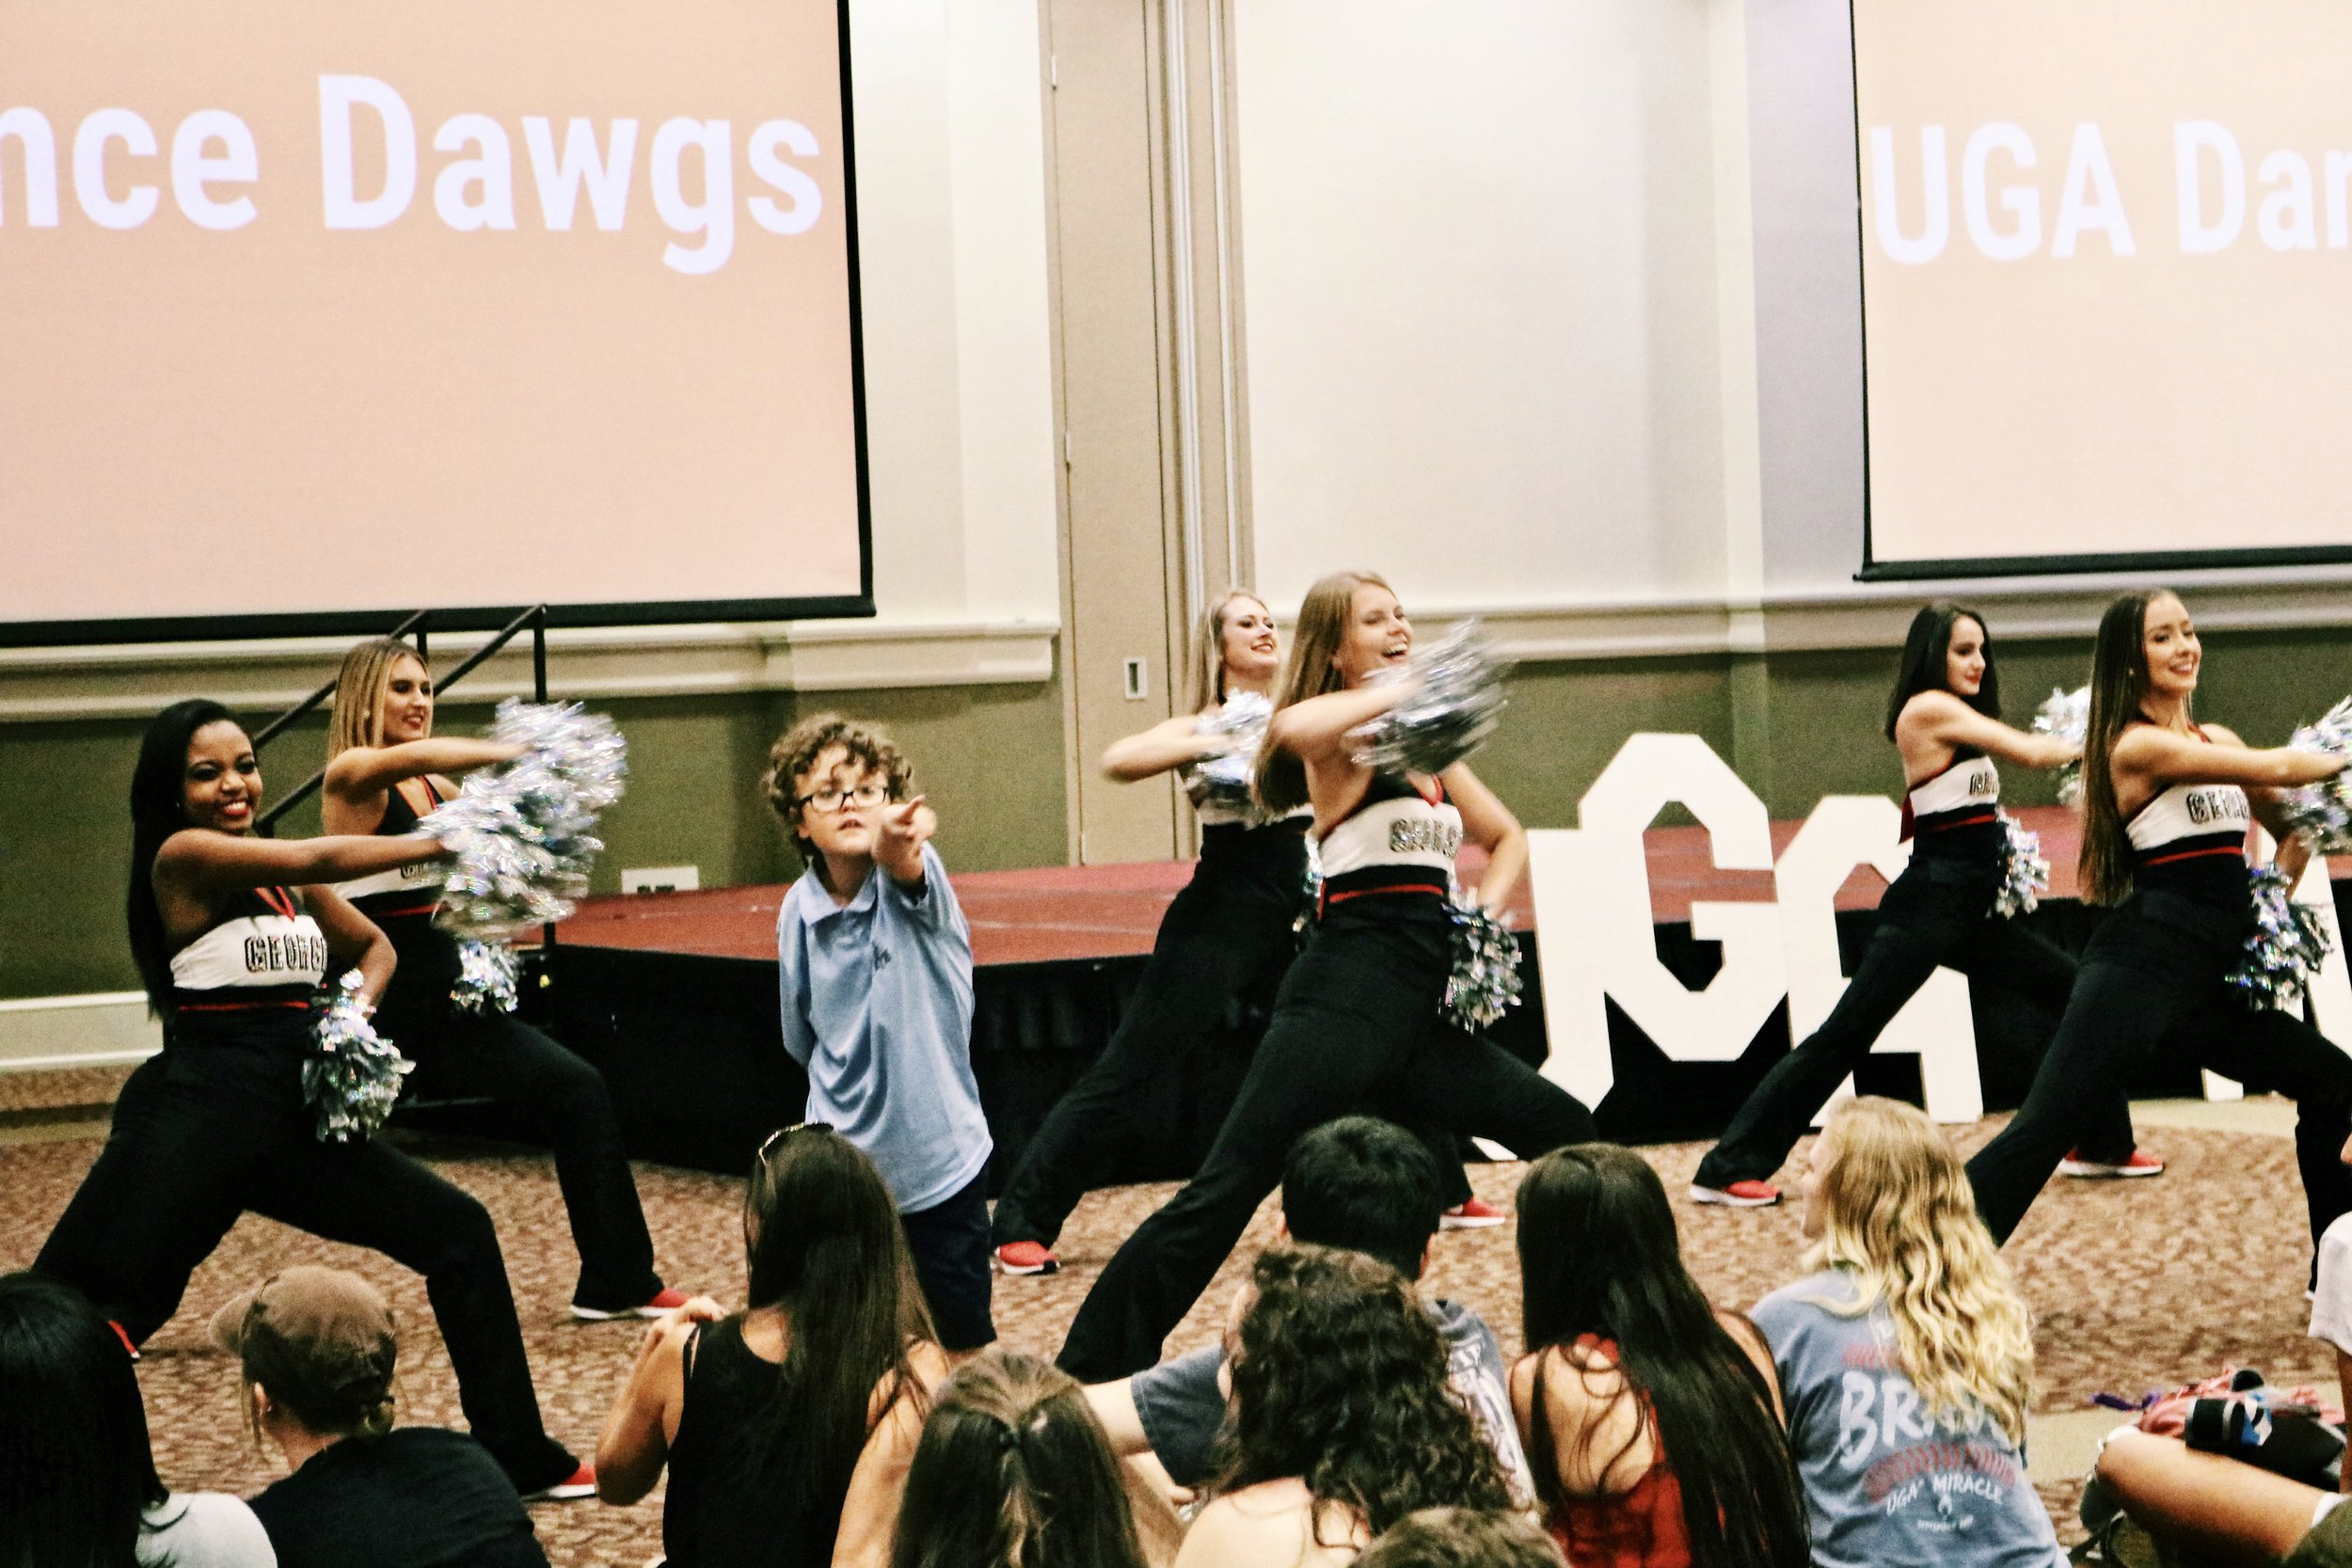 Parker Grelecki with the UGA Dance Dawgs